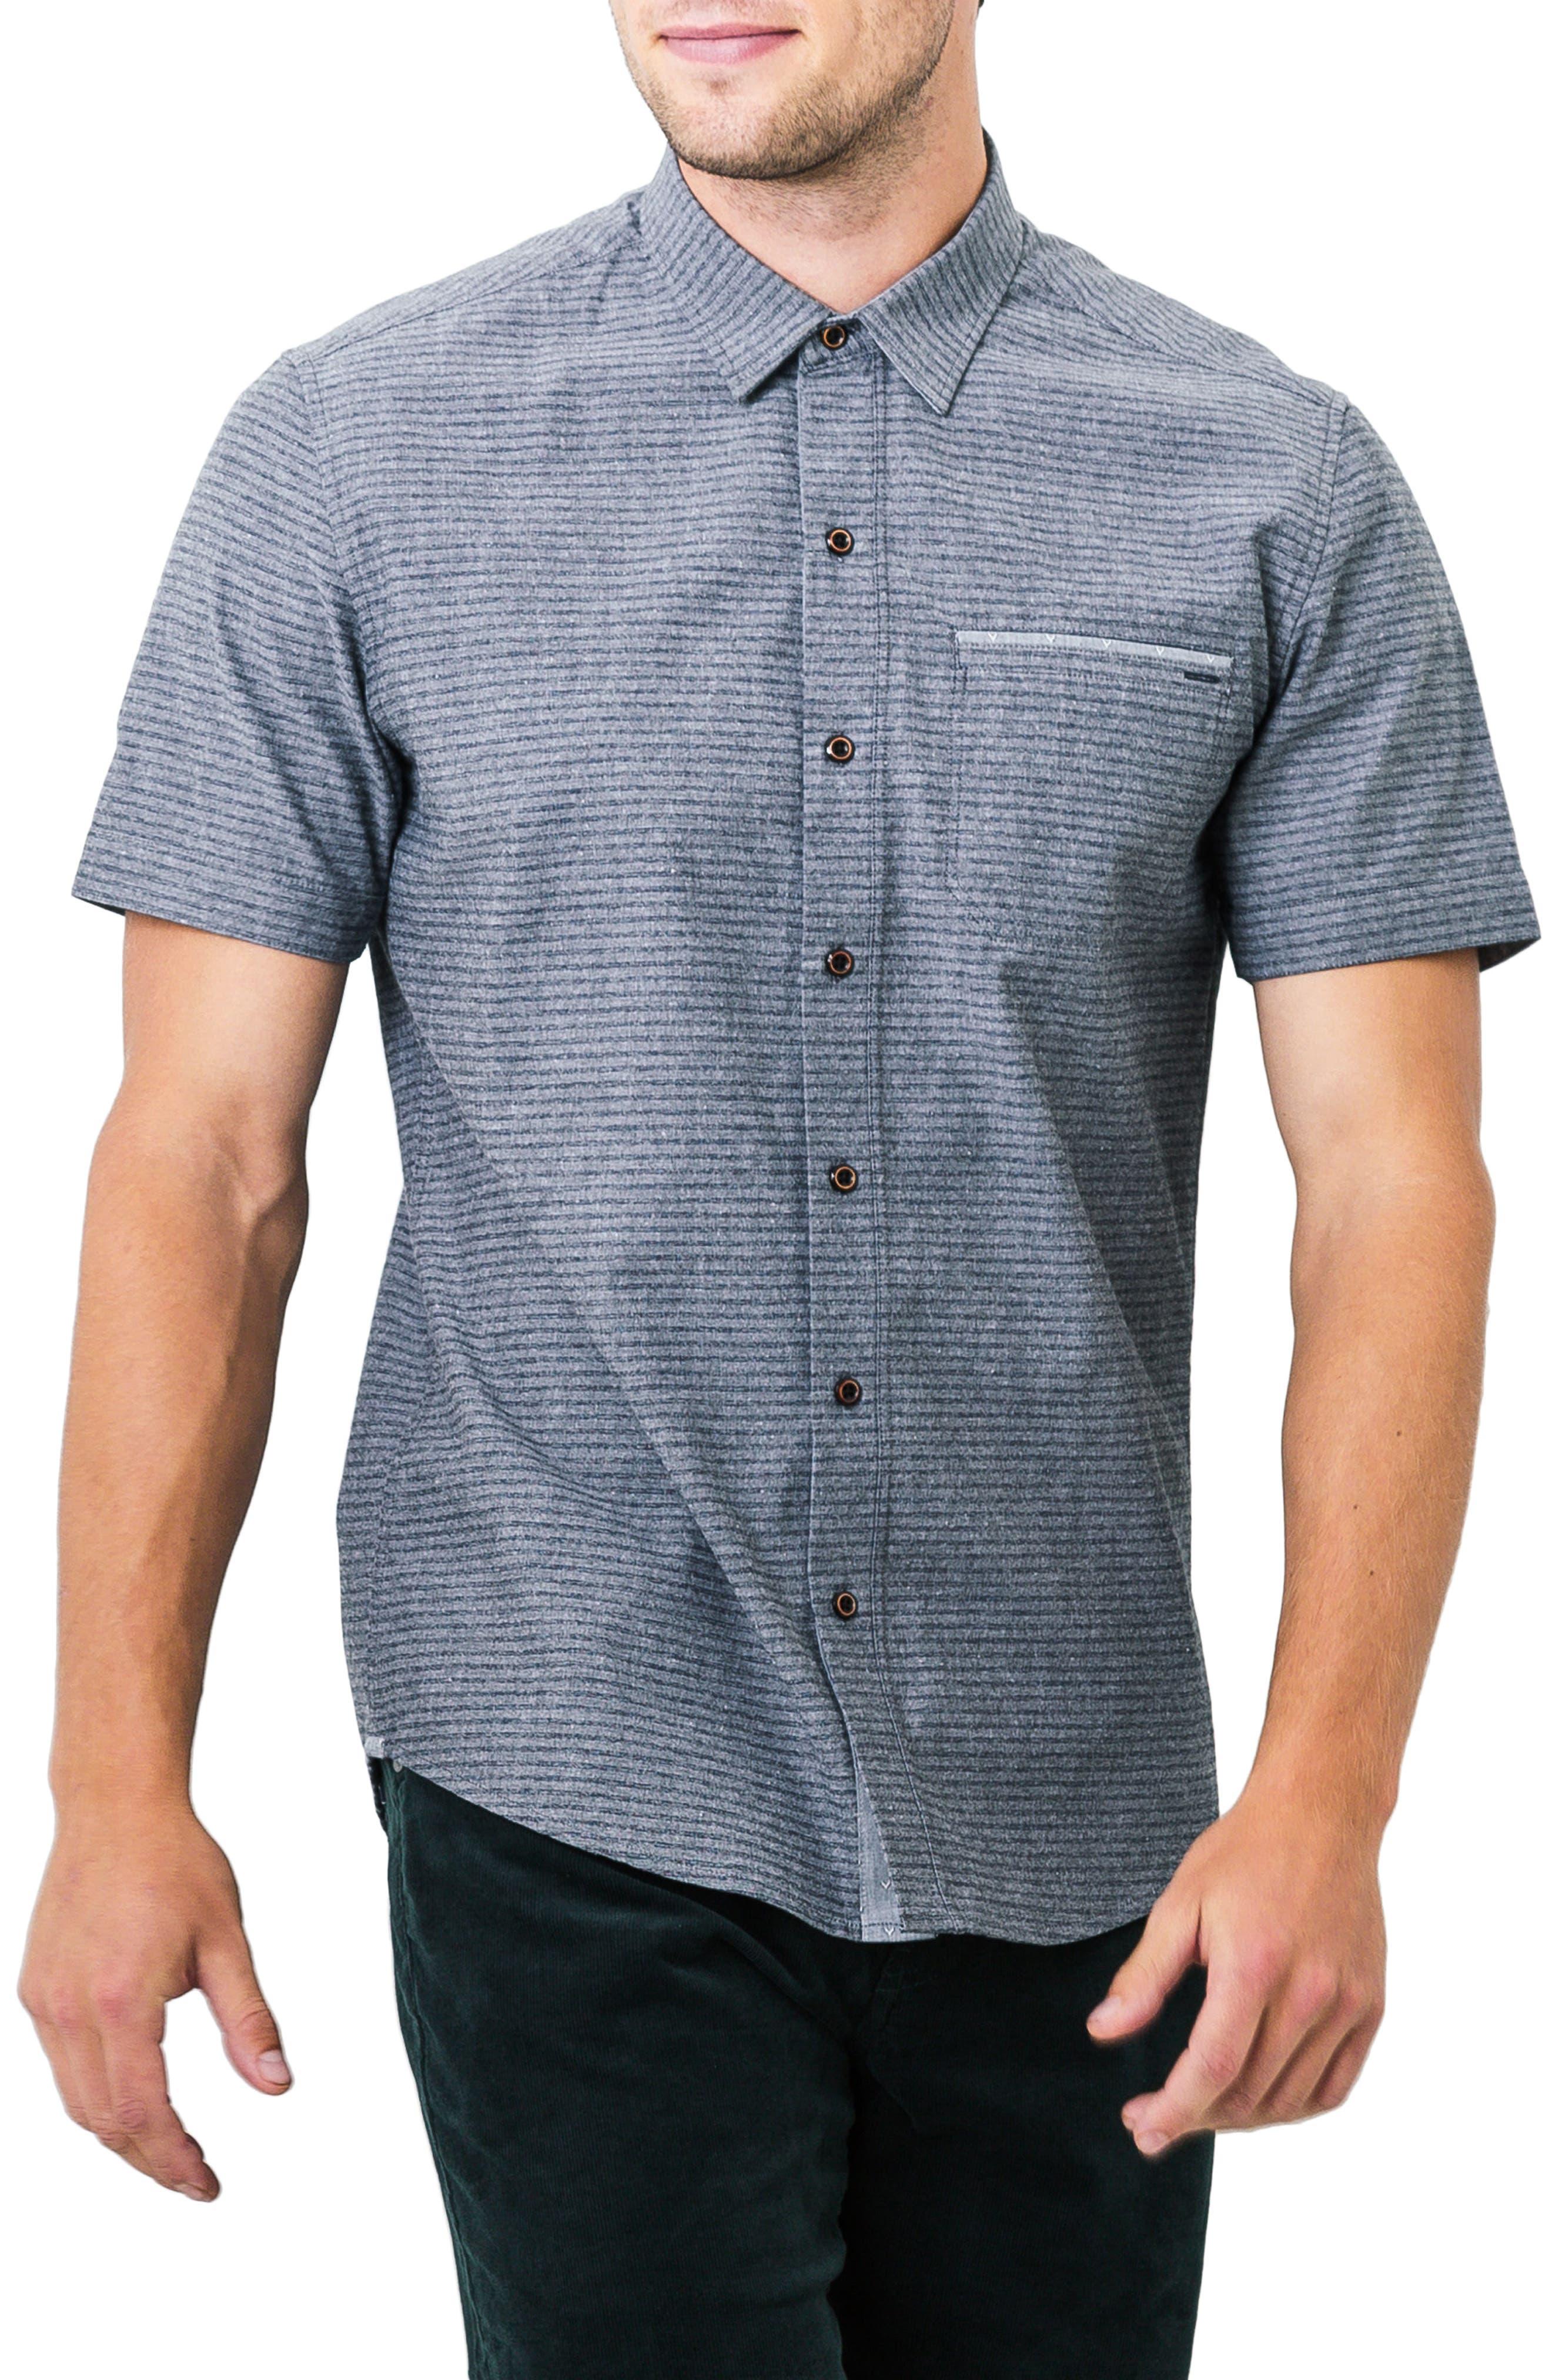 7 Diamonds The Crunch Slim Fit Short Sleeve Sport Shirt